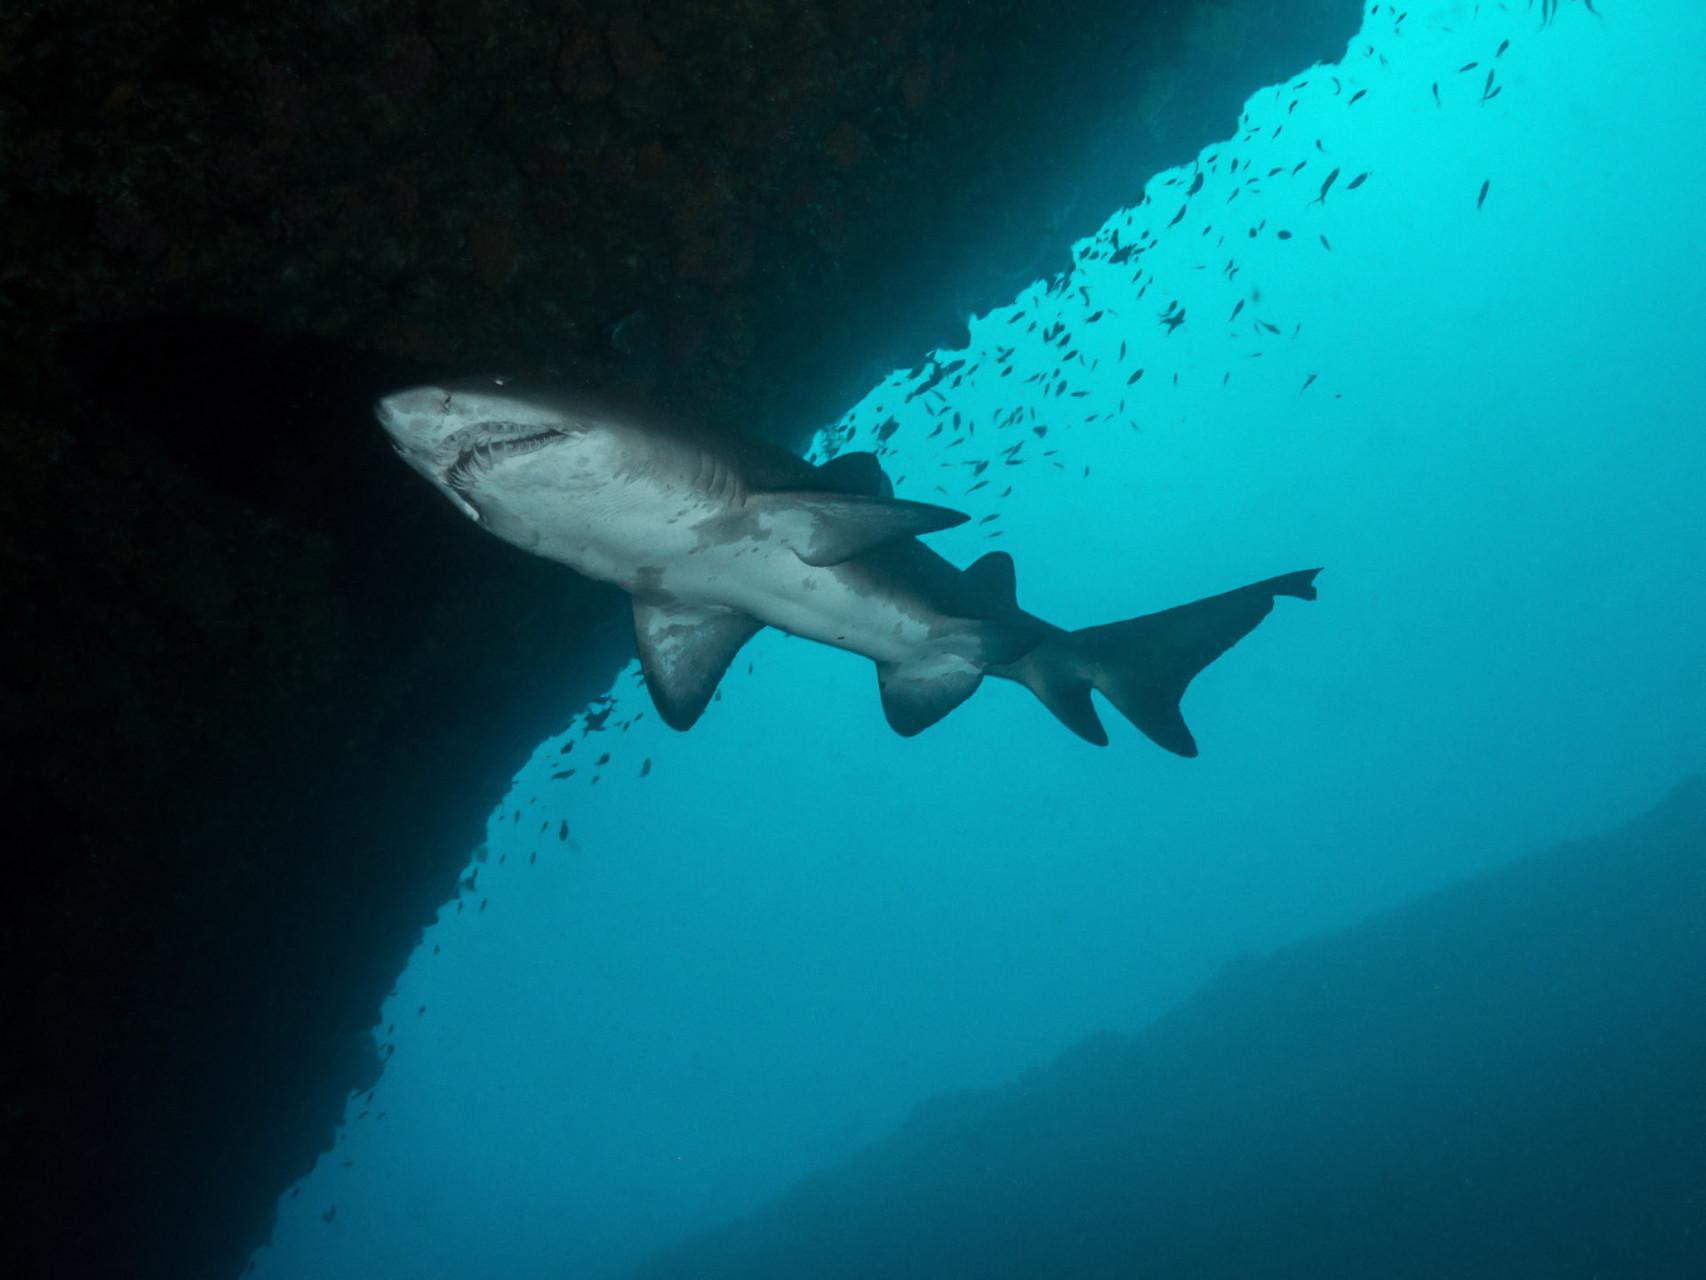 Raggie (Ragged tooth shark or Sandtiger shark)